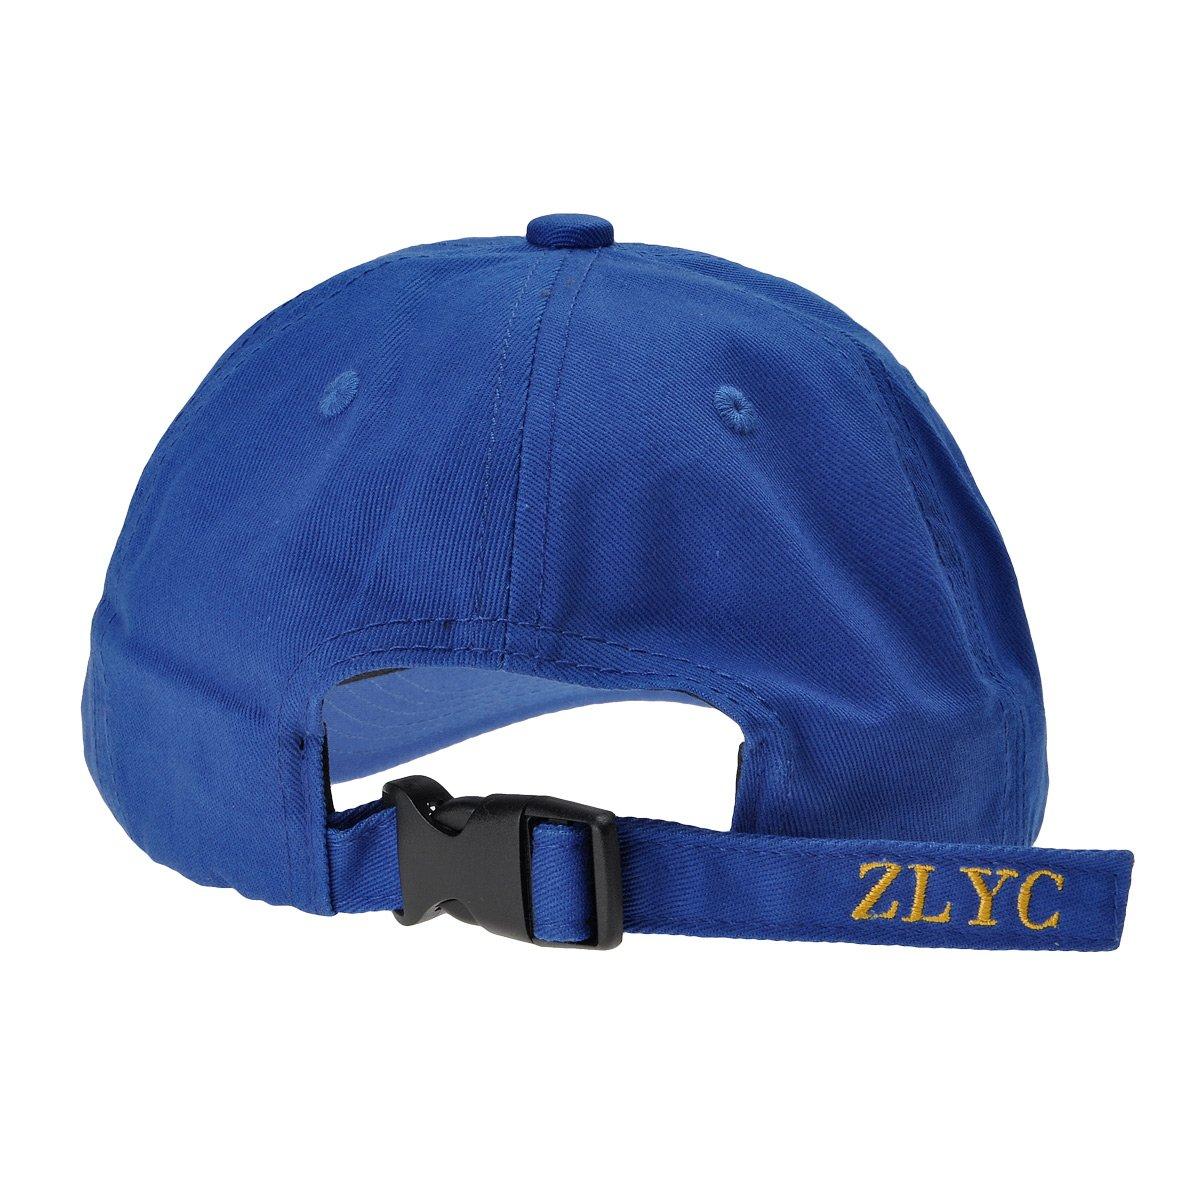 ZLYC Adjustable Cotton Baseball Cap Hat Fashion Embroidered